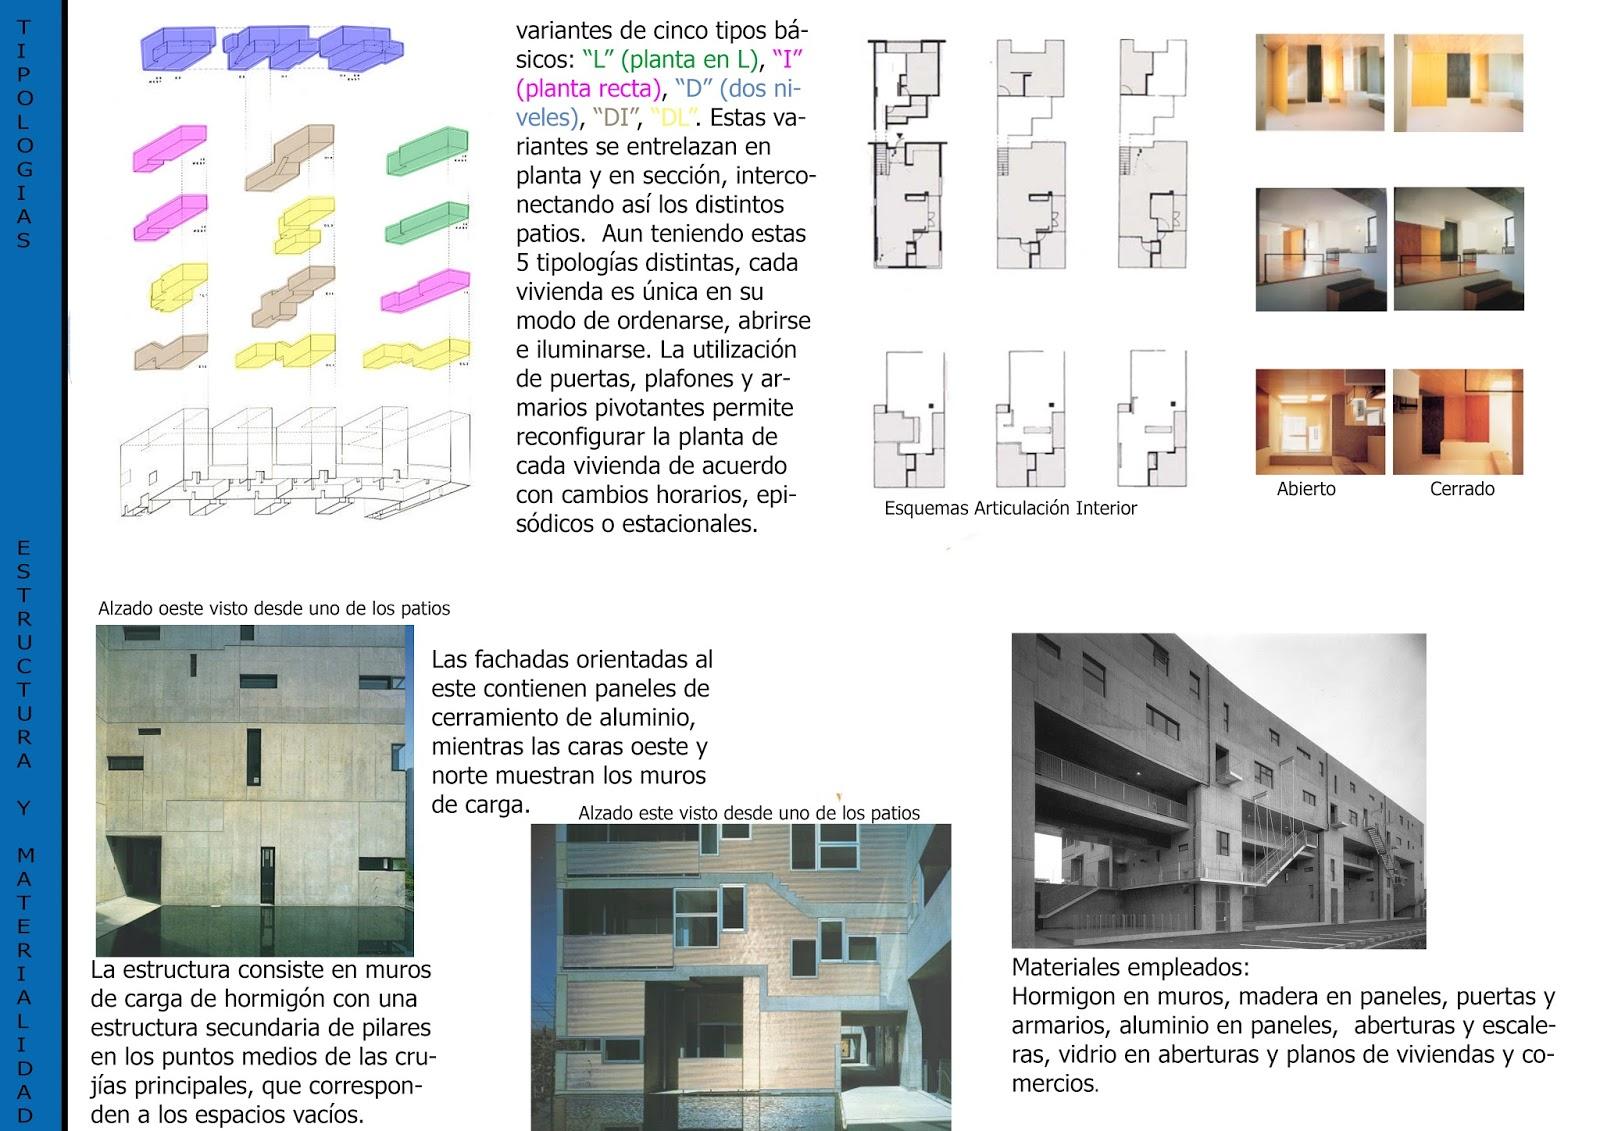 Matias bravo dise o arquitectonico 1 cresta faud 2015 - Paginas de viviendas ...